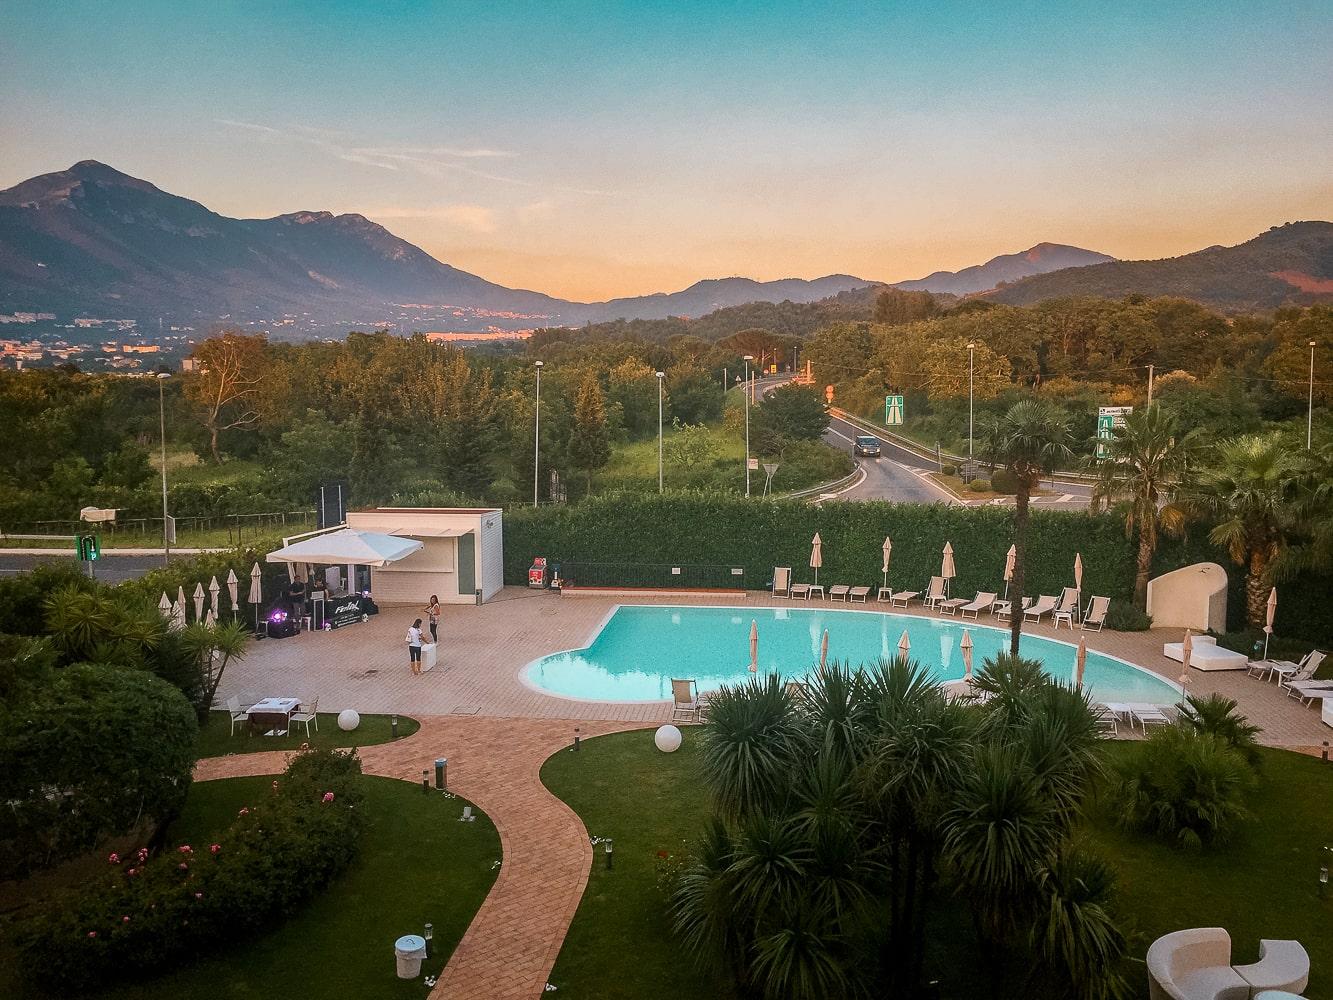 Salerno Italy, Salerno Italy Hotel, Travel Blogger, Travel Photography